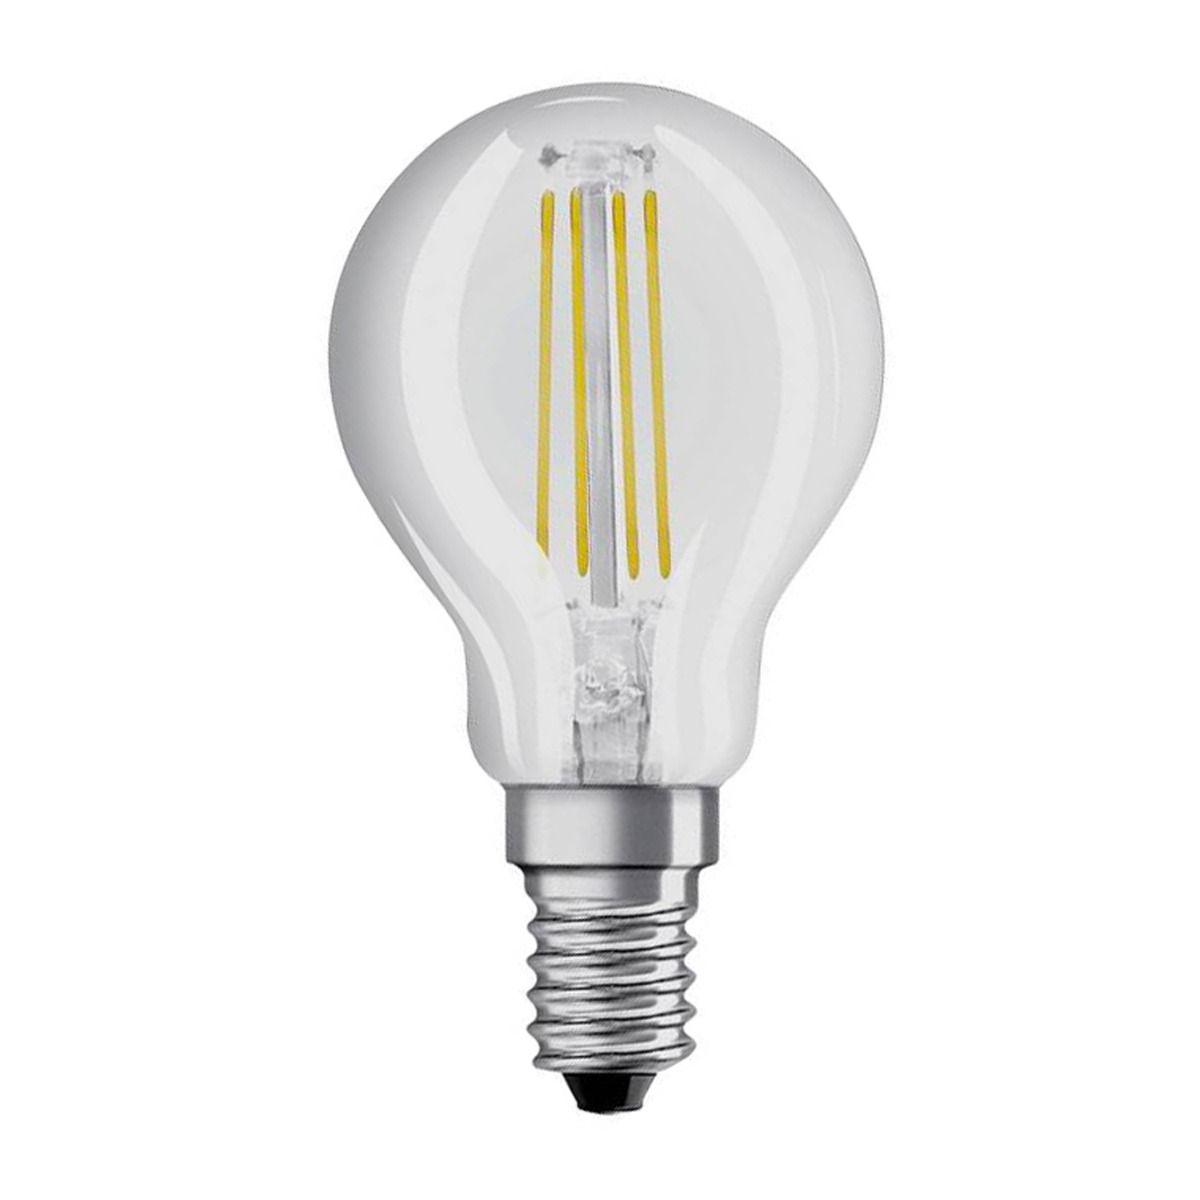 Osram LED Retrofit Classico E14 P 4W 840 Chiara | Bianco Freddo - Sostitua 40W